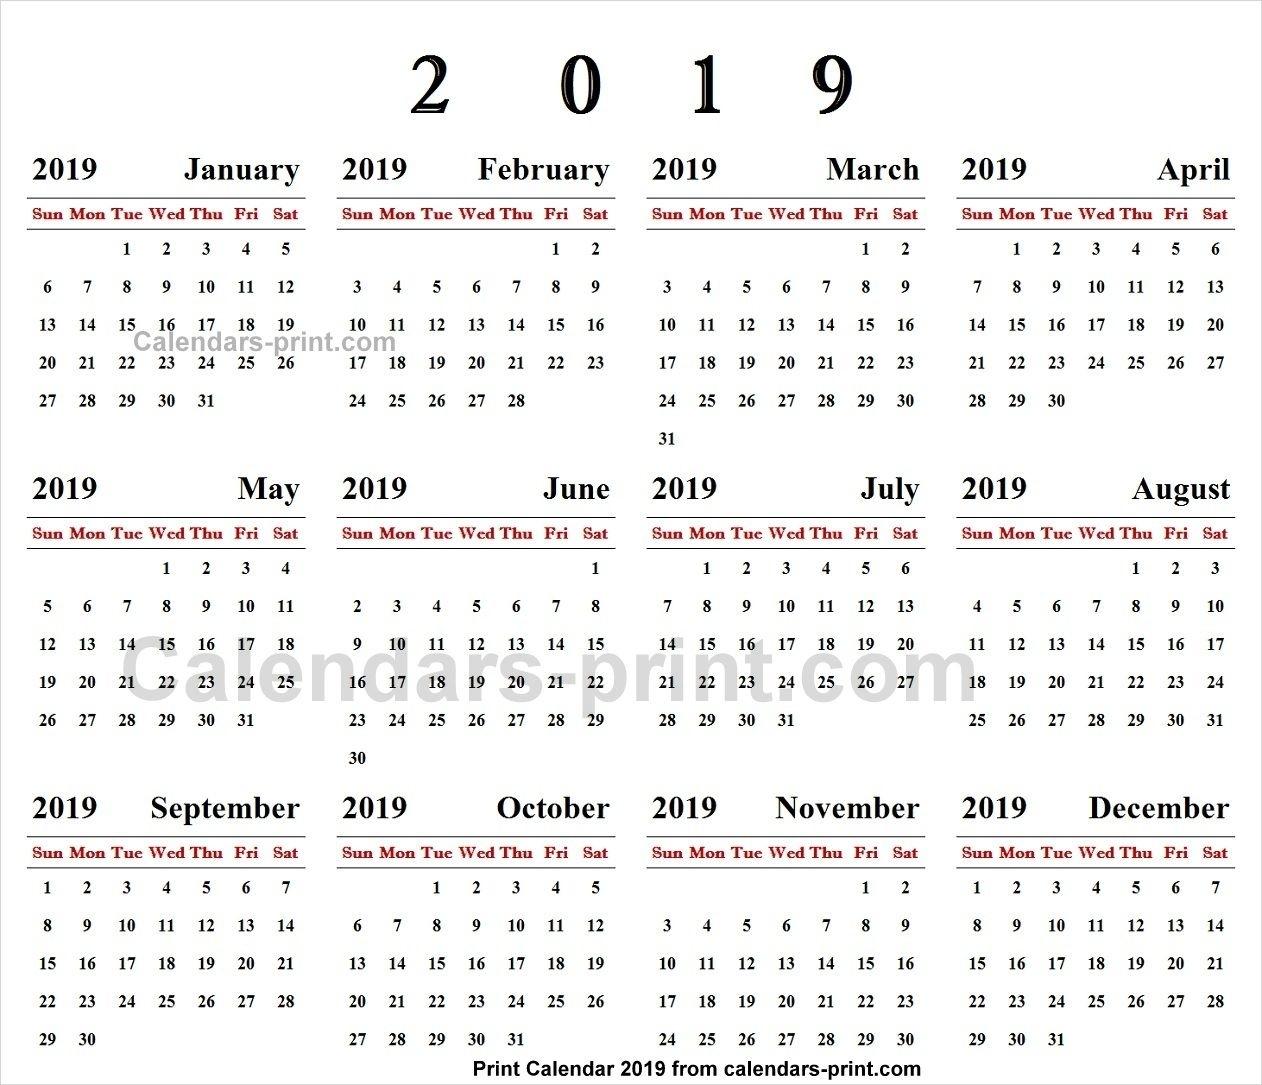 Online Calendar 2019 | 2019 Yearly Calendar | Calendar 2019 Online Calendar Printing With Photos